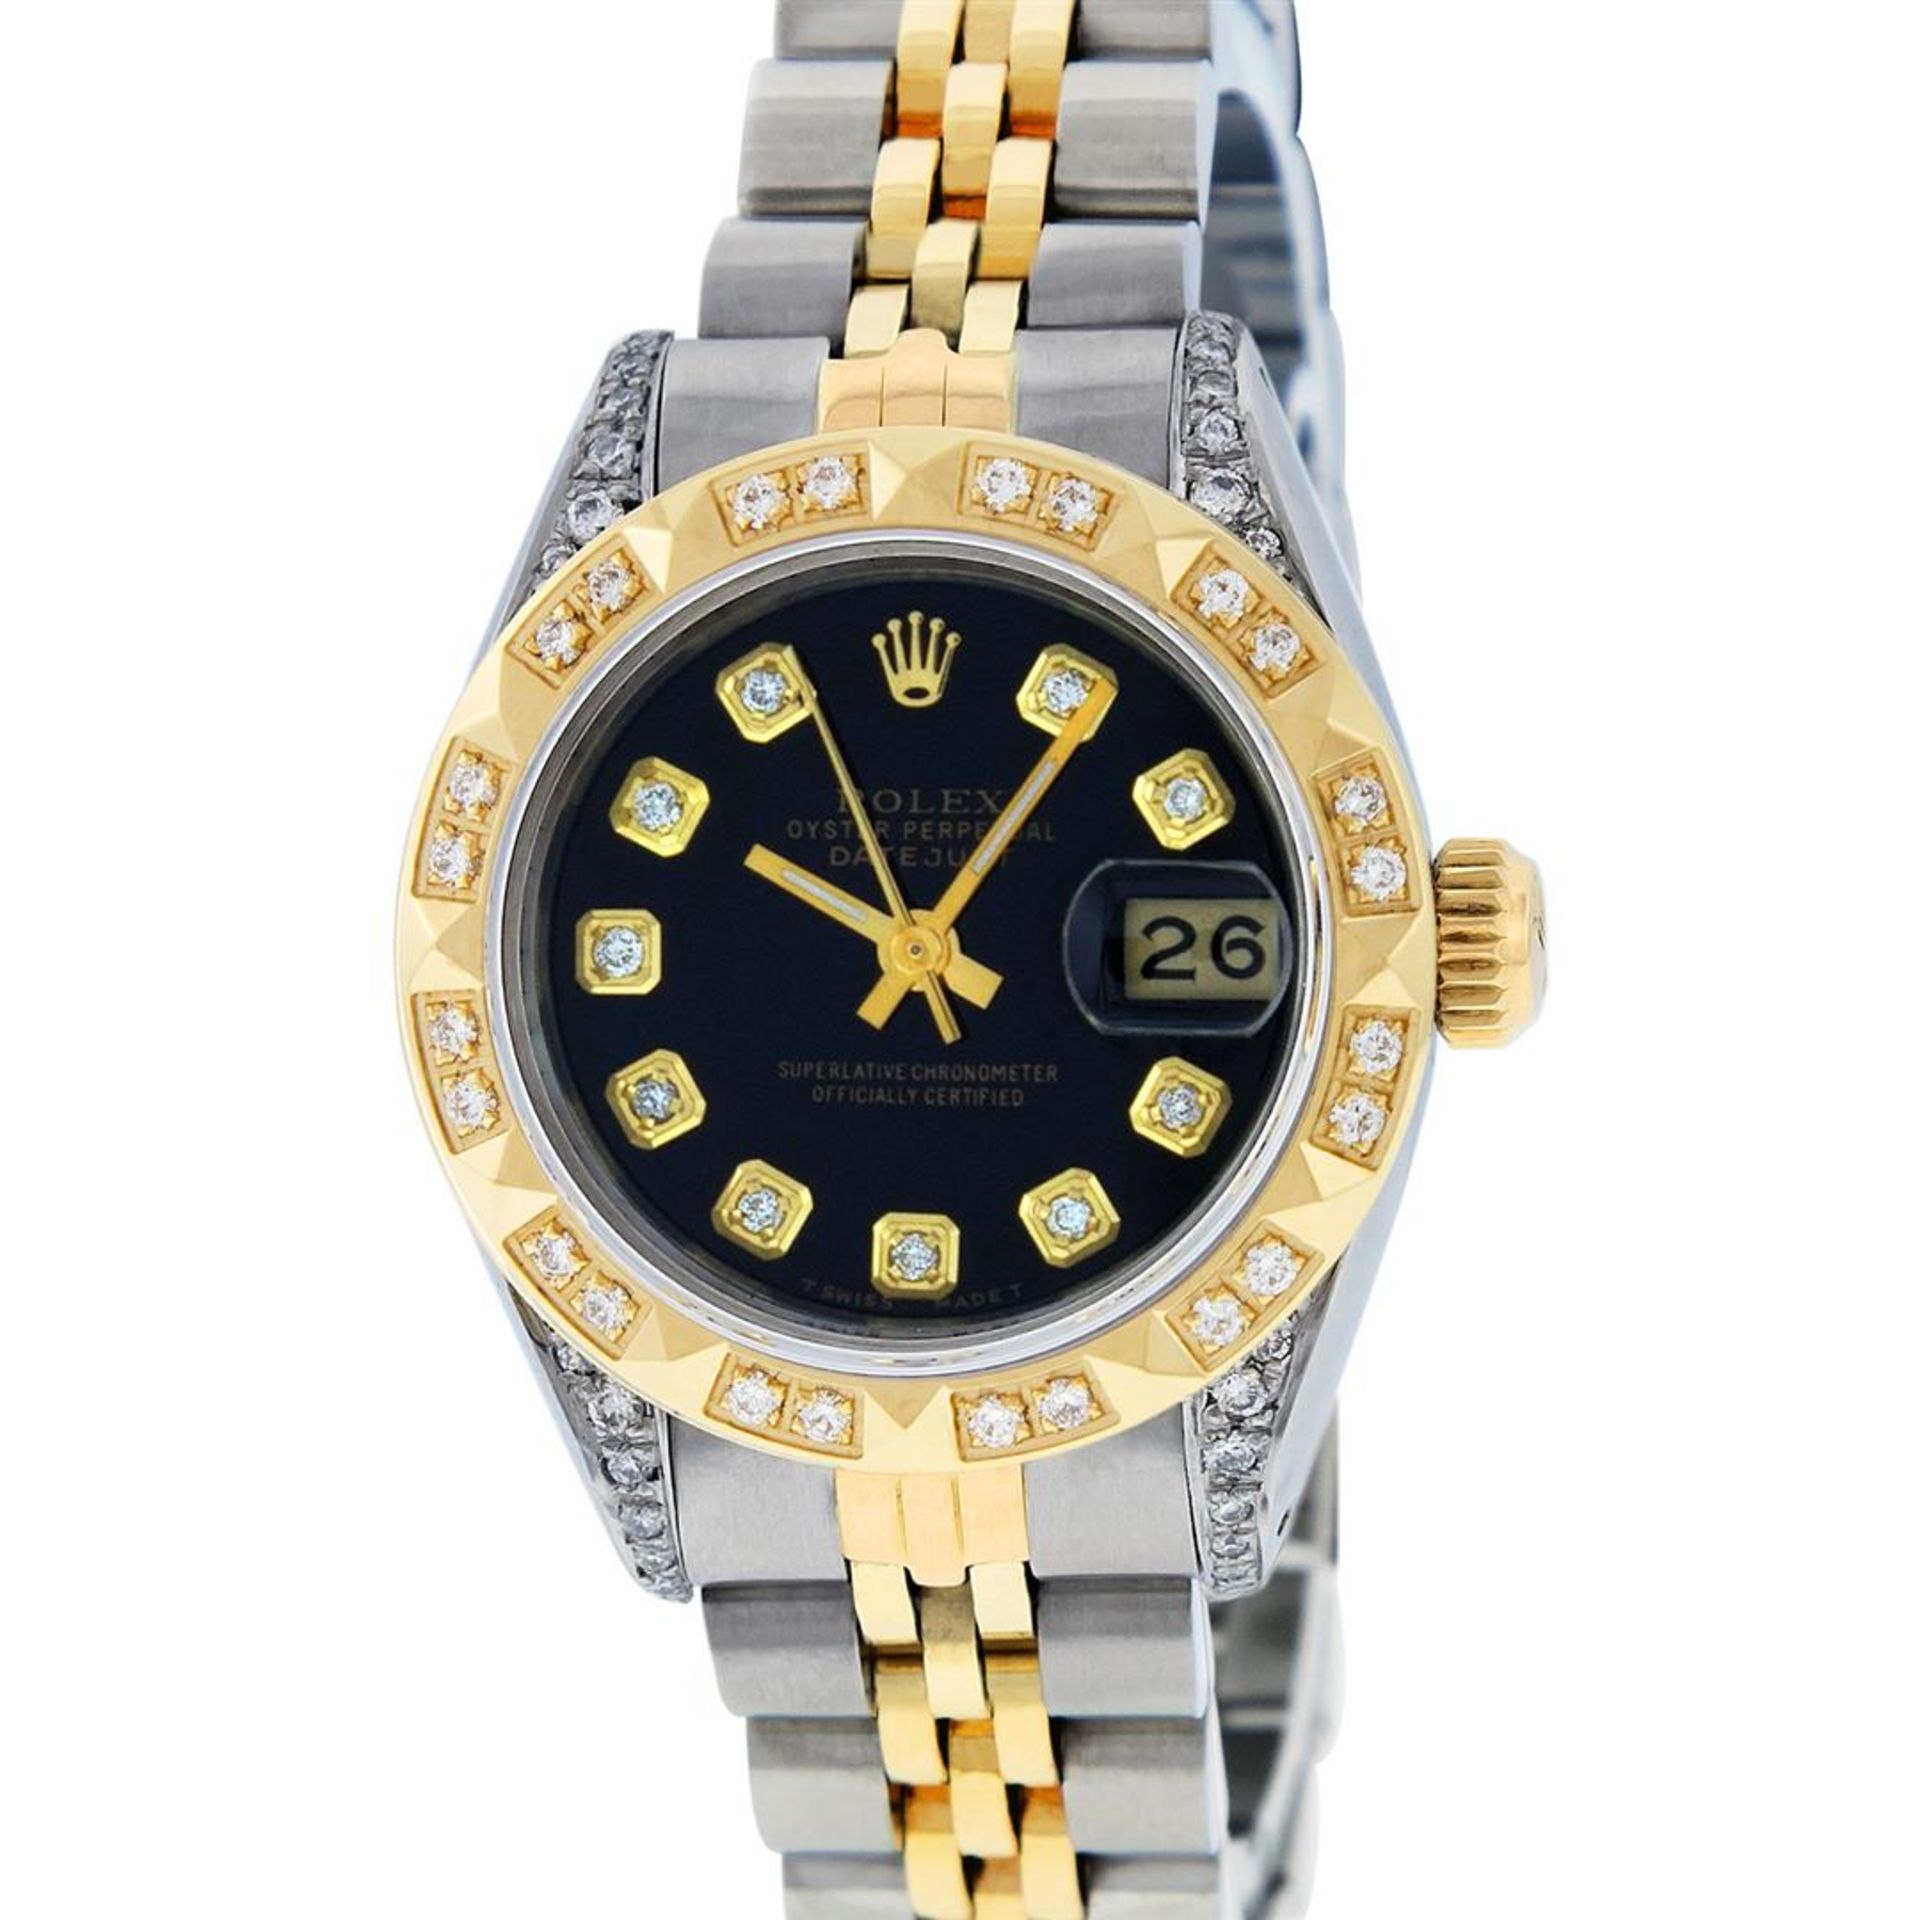 Rolex Ladies 2 Tone Black Lugs & Pyramid Diamond Datejust Wriswatch - Image 2 of 7